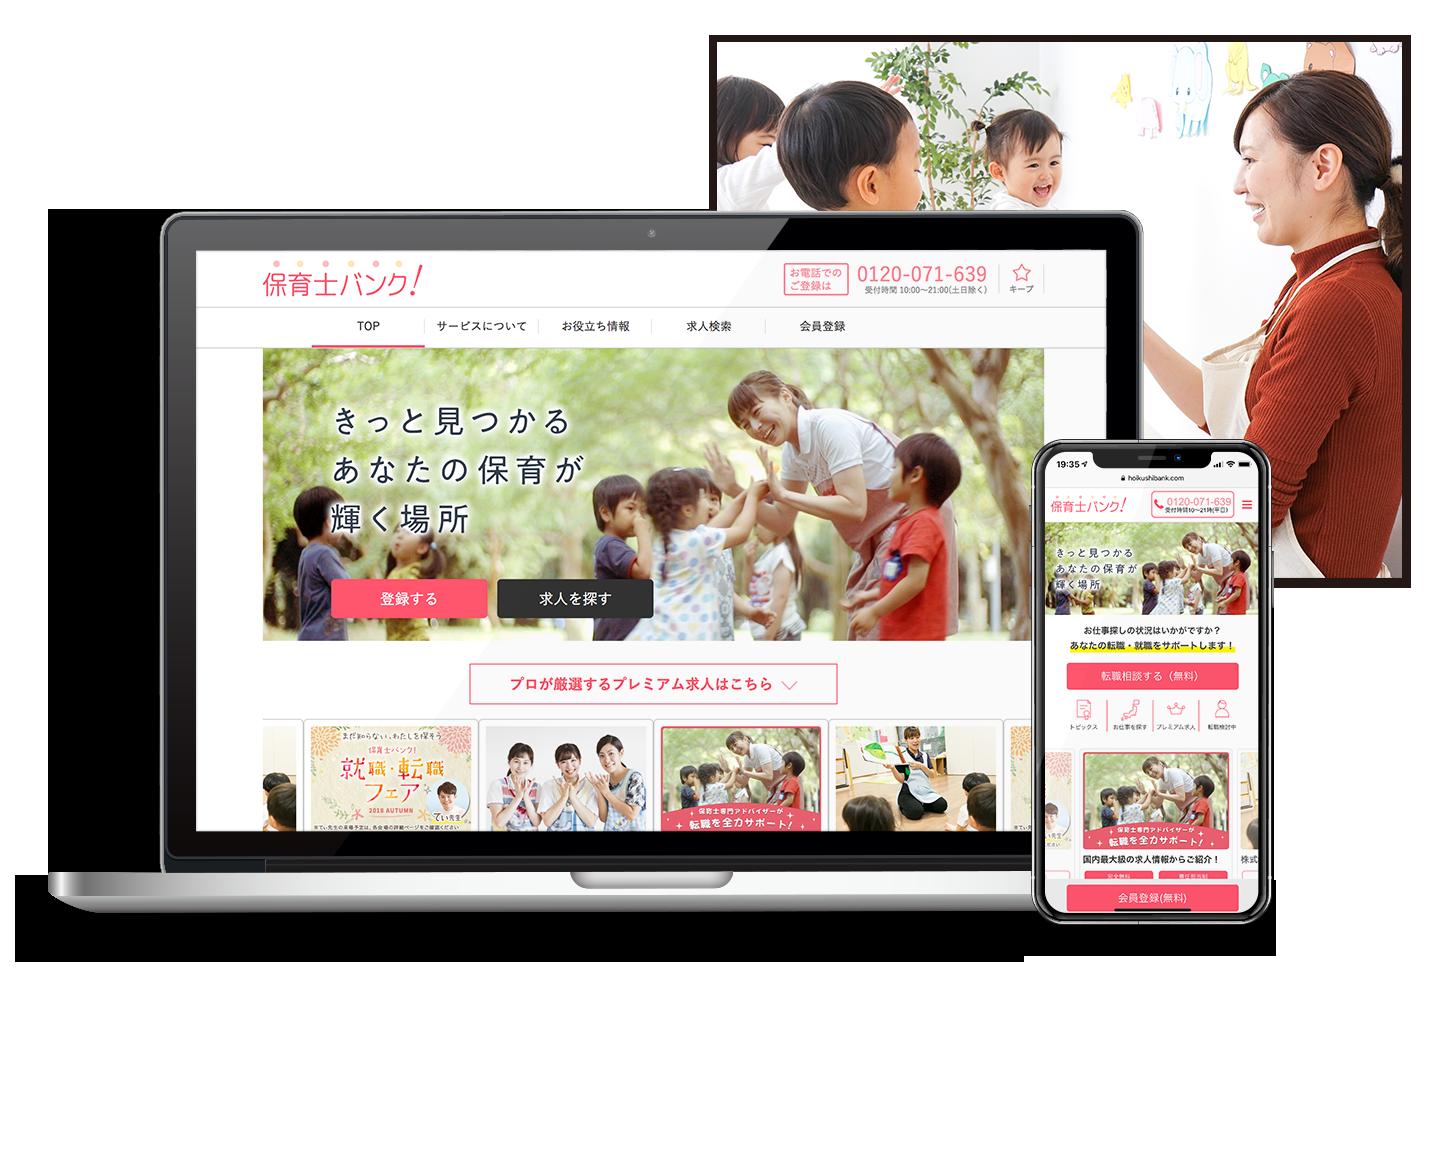 日本最大級。保育士・幼稚園教諭向け転職支援サイト